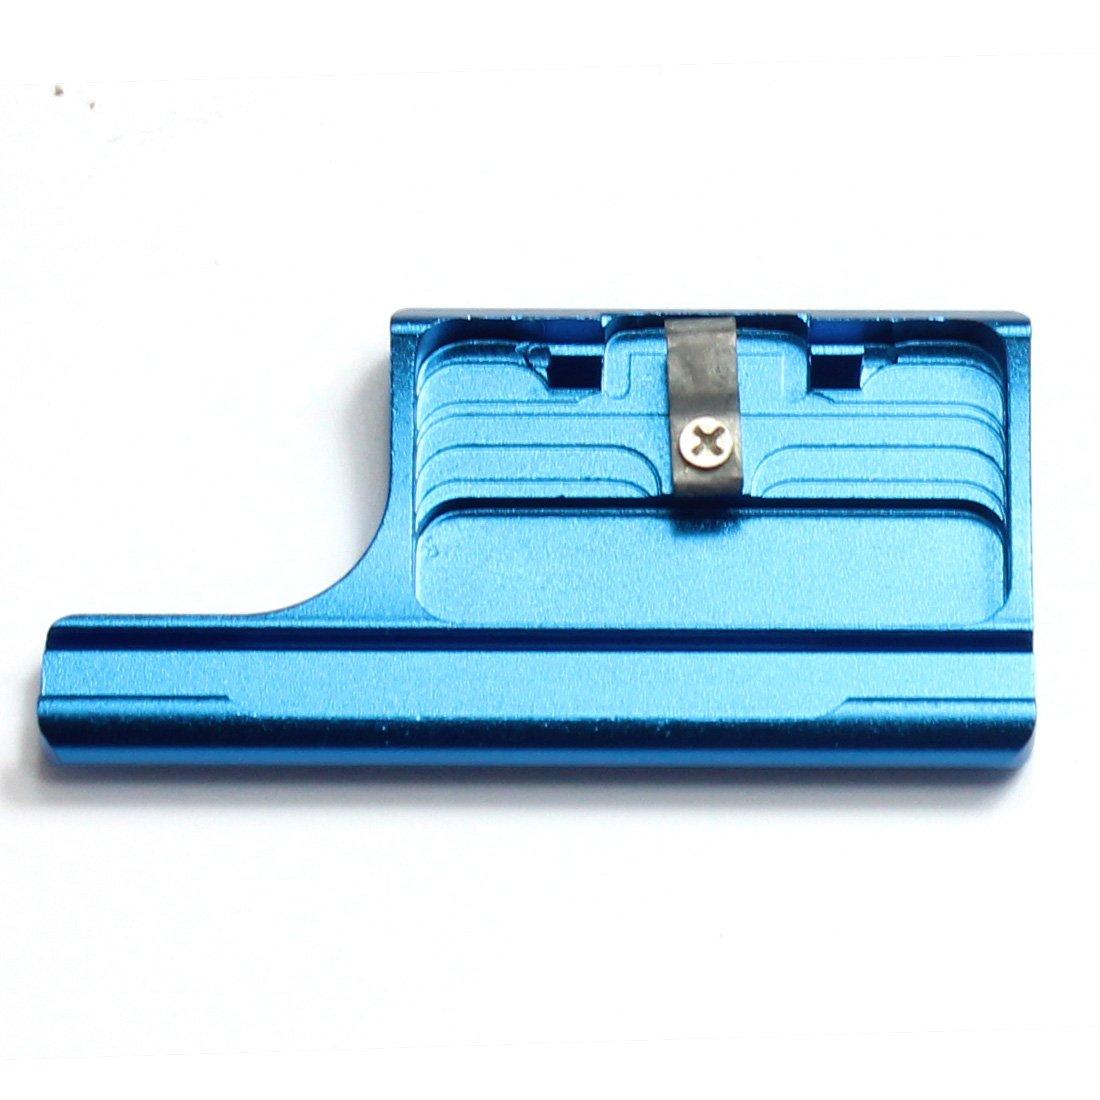 GoPro Hero 3+ 4用メタルカバー 防水ケースロック ブルー 035   B07KSZSCW5